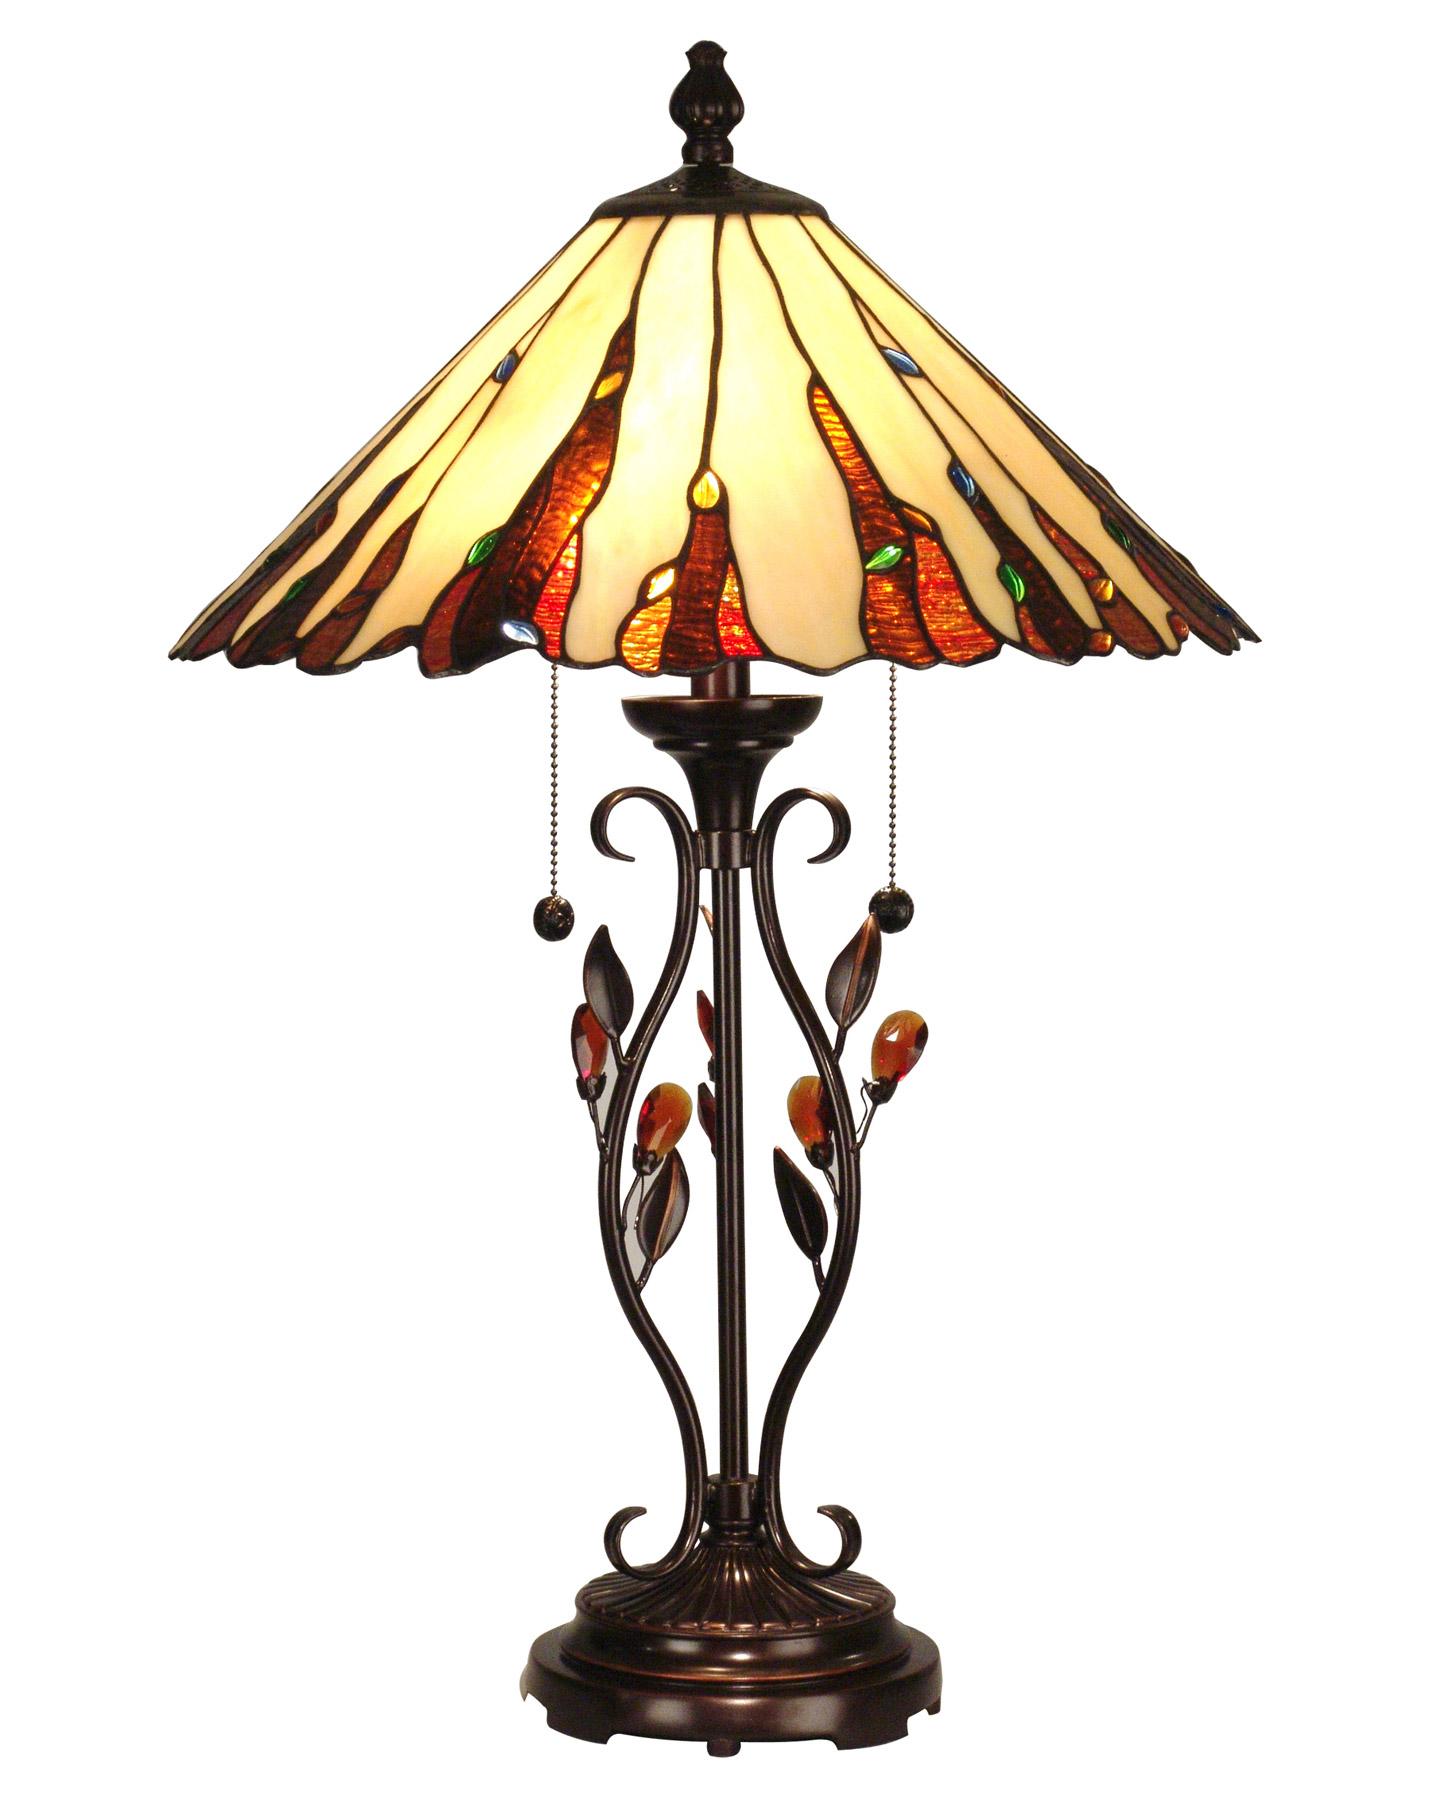 Dale Tiffany Tt90178 Tiffany Ripley Table Lamp